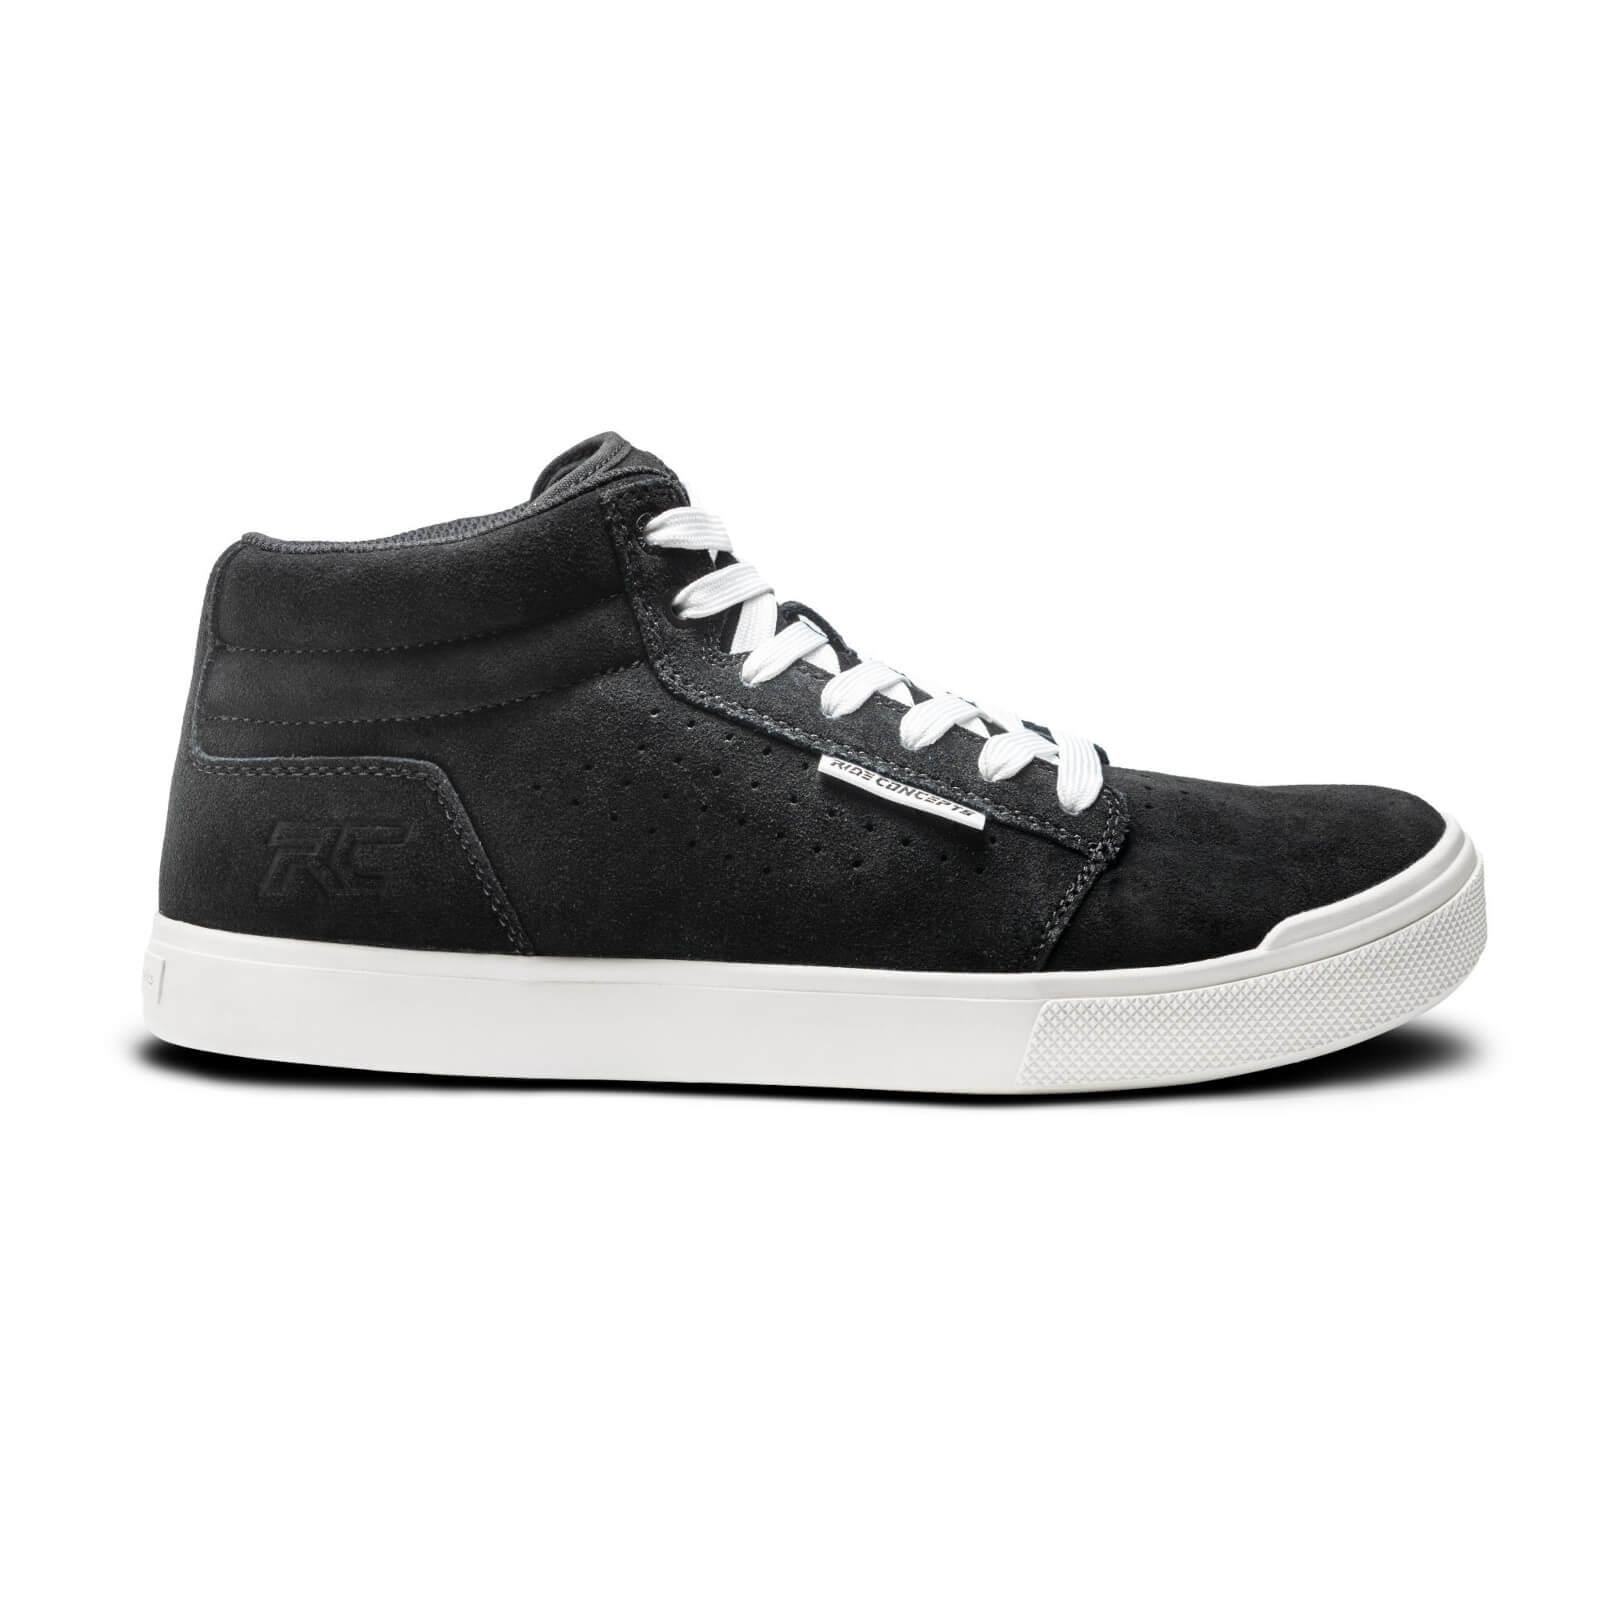 Ride Concepts Vice Mid Flat MTB Shoes - UK 10.5/EU 44.5 - Black/White